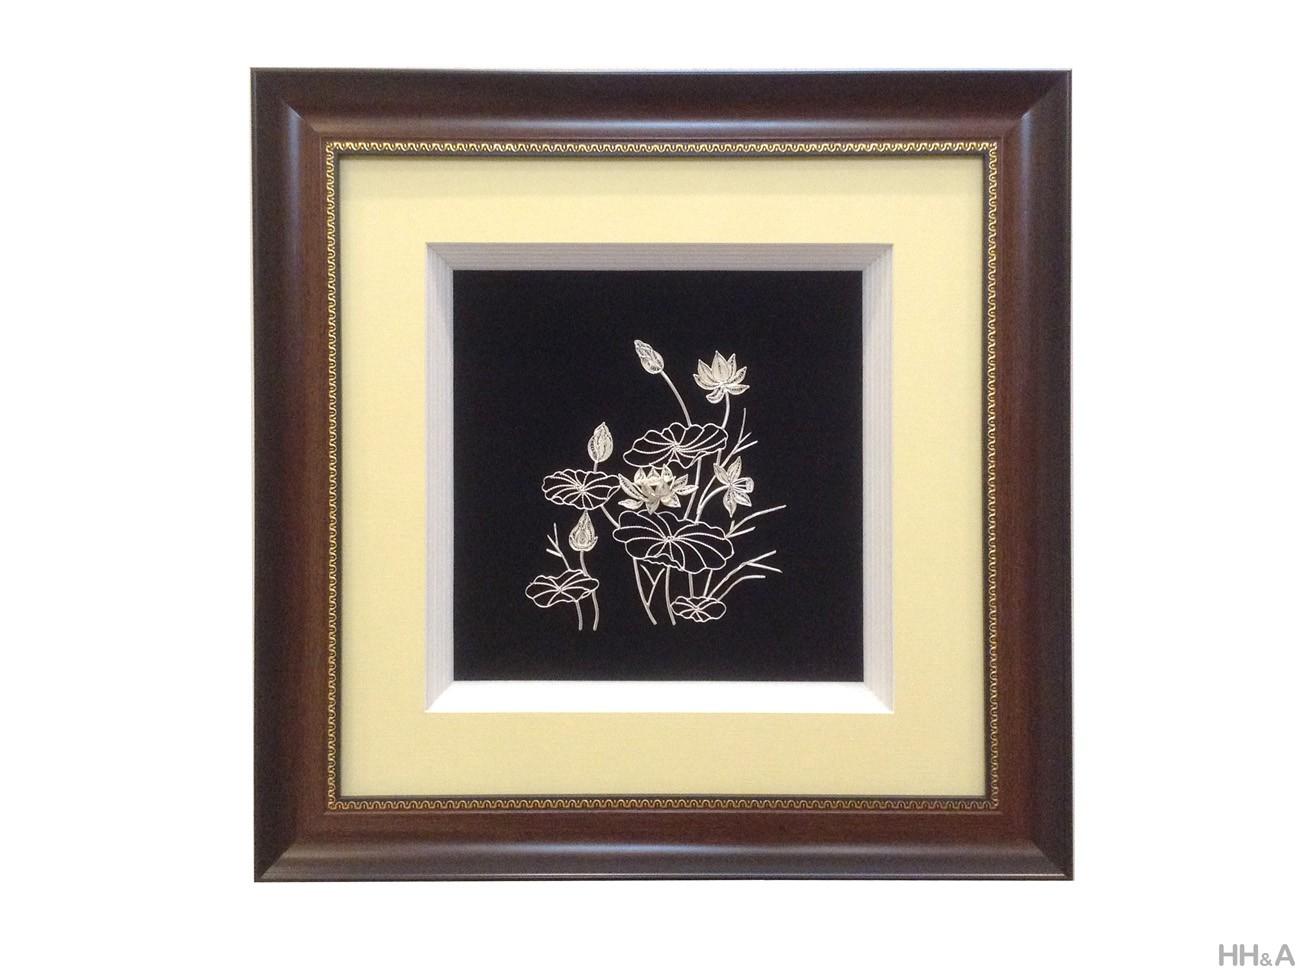 Tranh bạc hoa sen 43x43